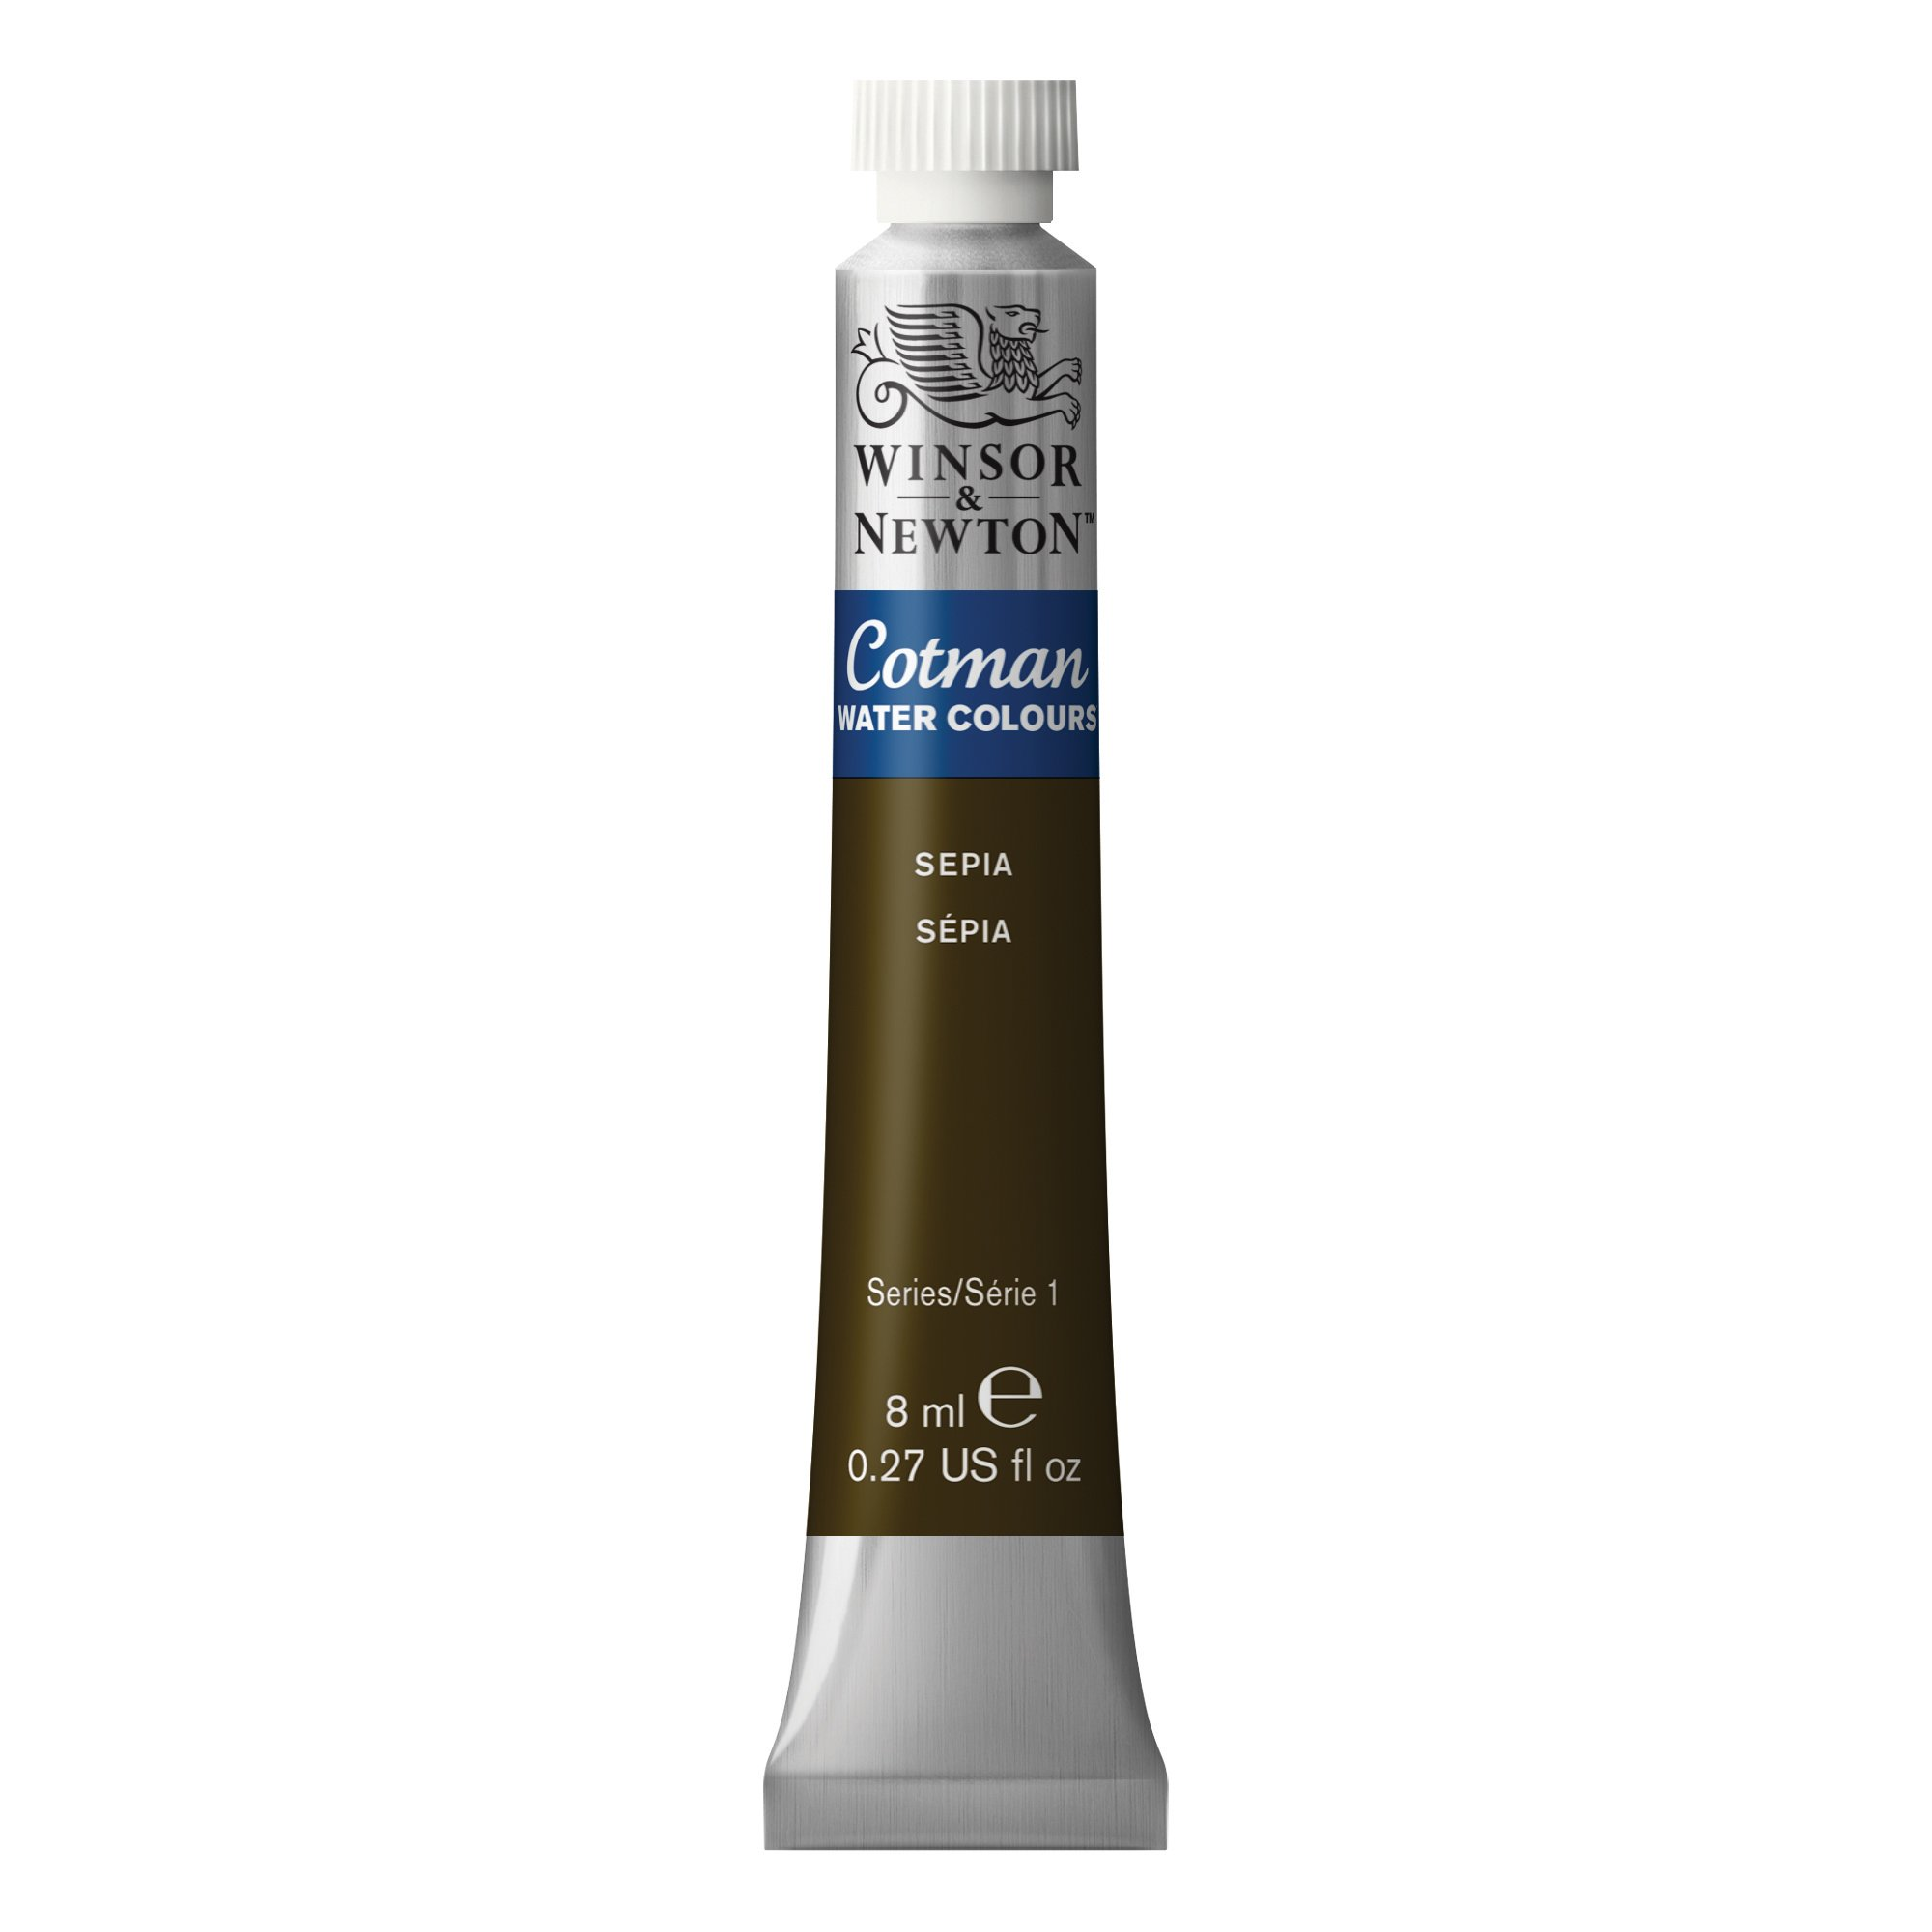 Winsor & Newton Cotman Water Colour Paint, 8ml tube, Sepia